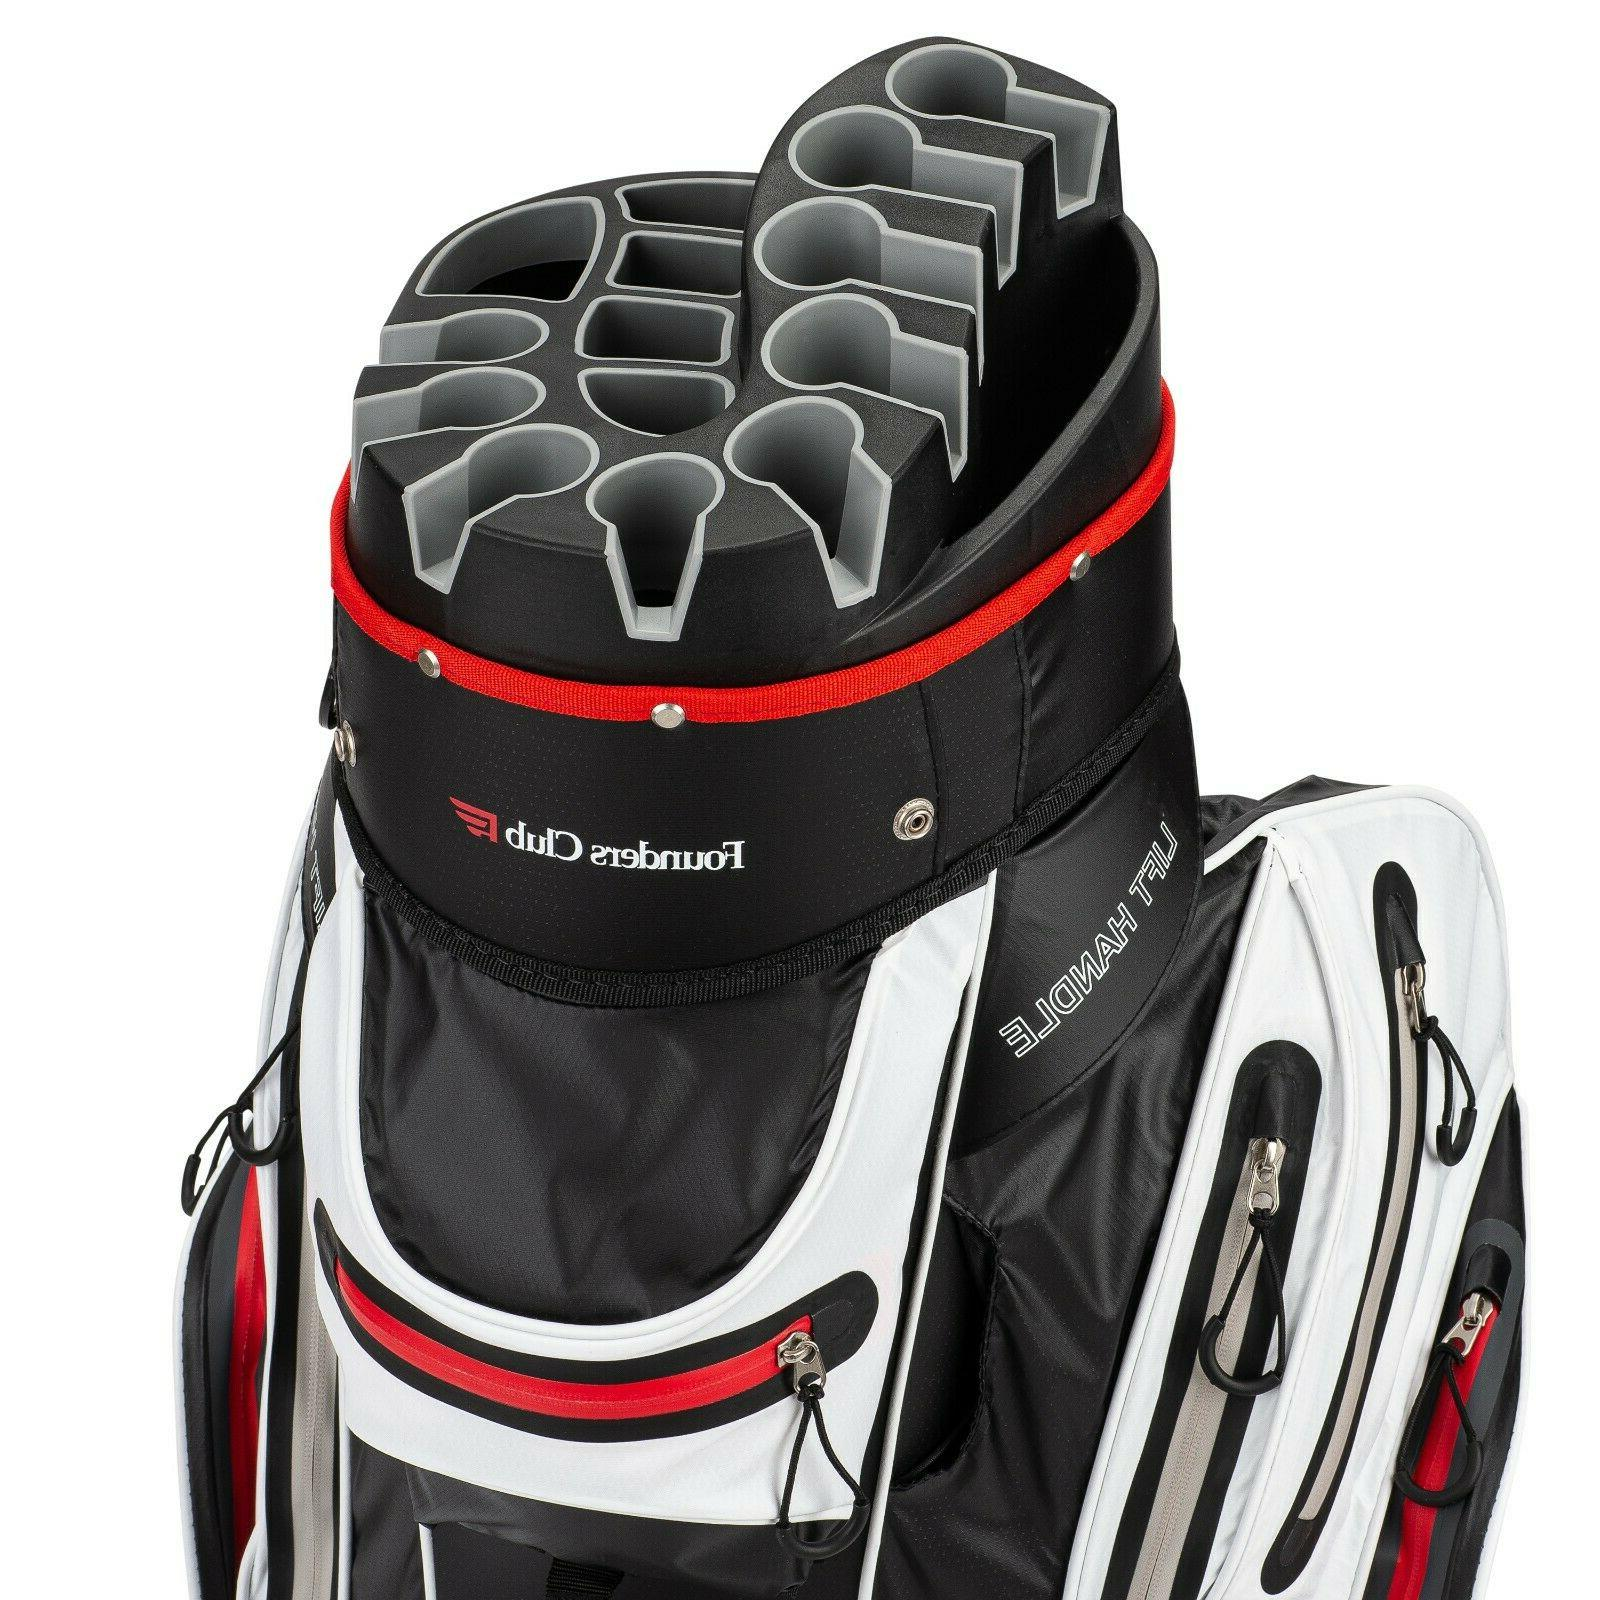 waterproof premium cart bag 14 way organizer